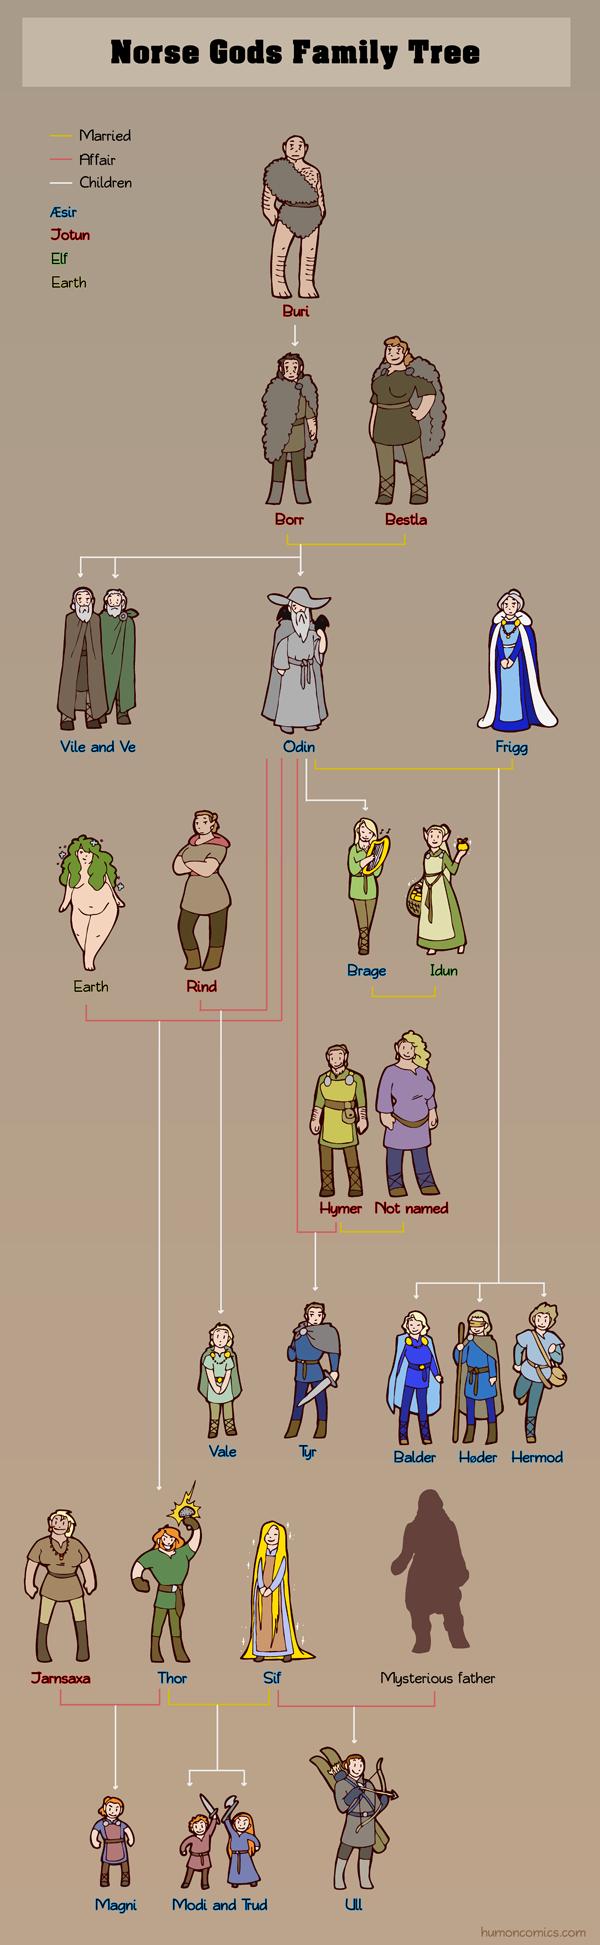 Norse Gods Family tree HumonComics.com